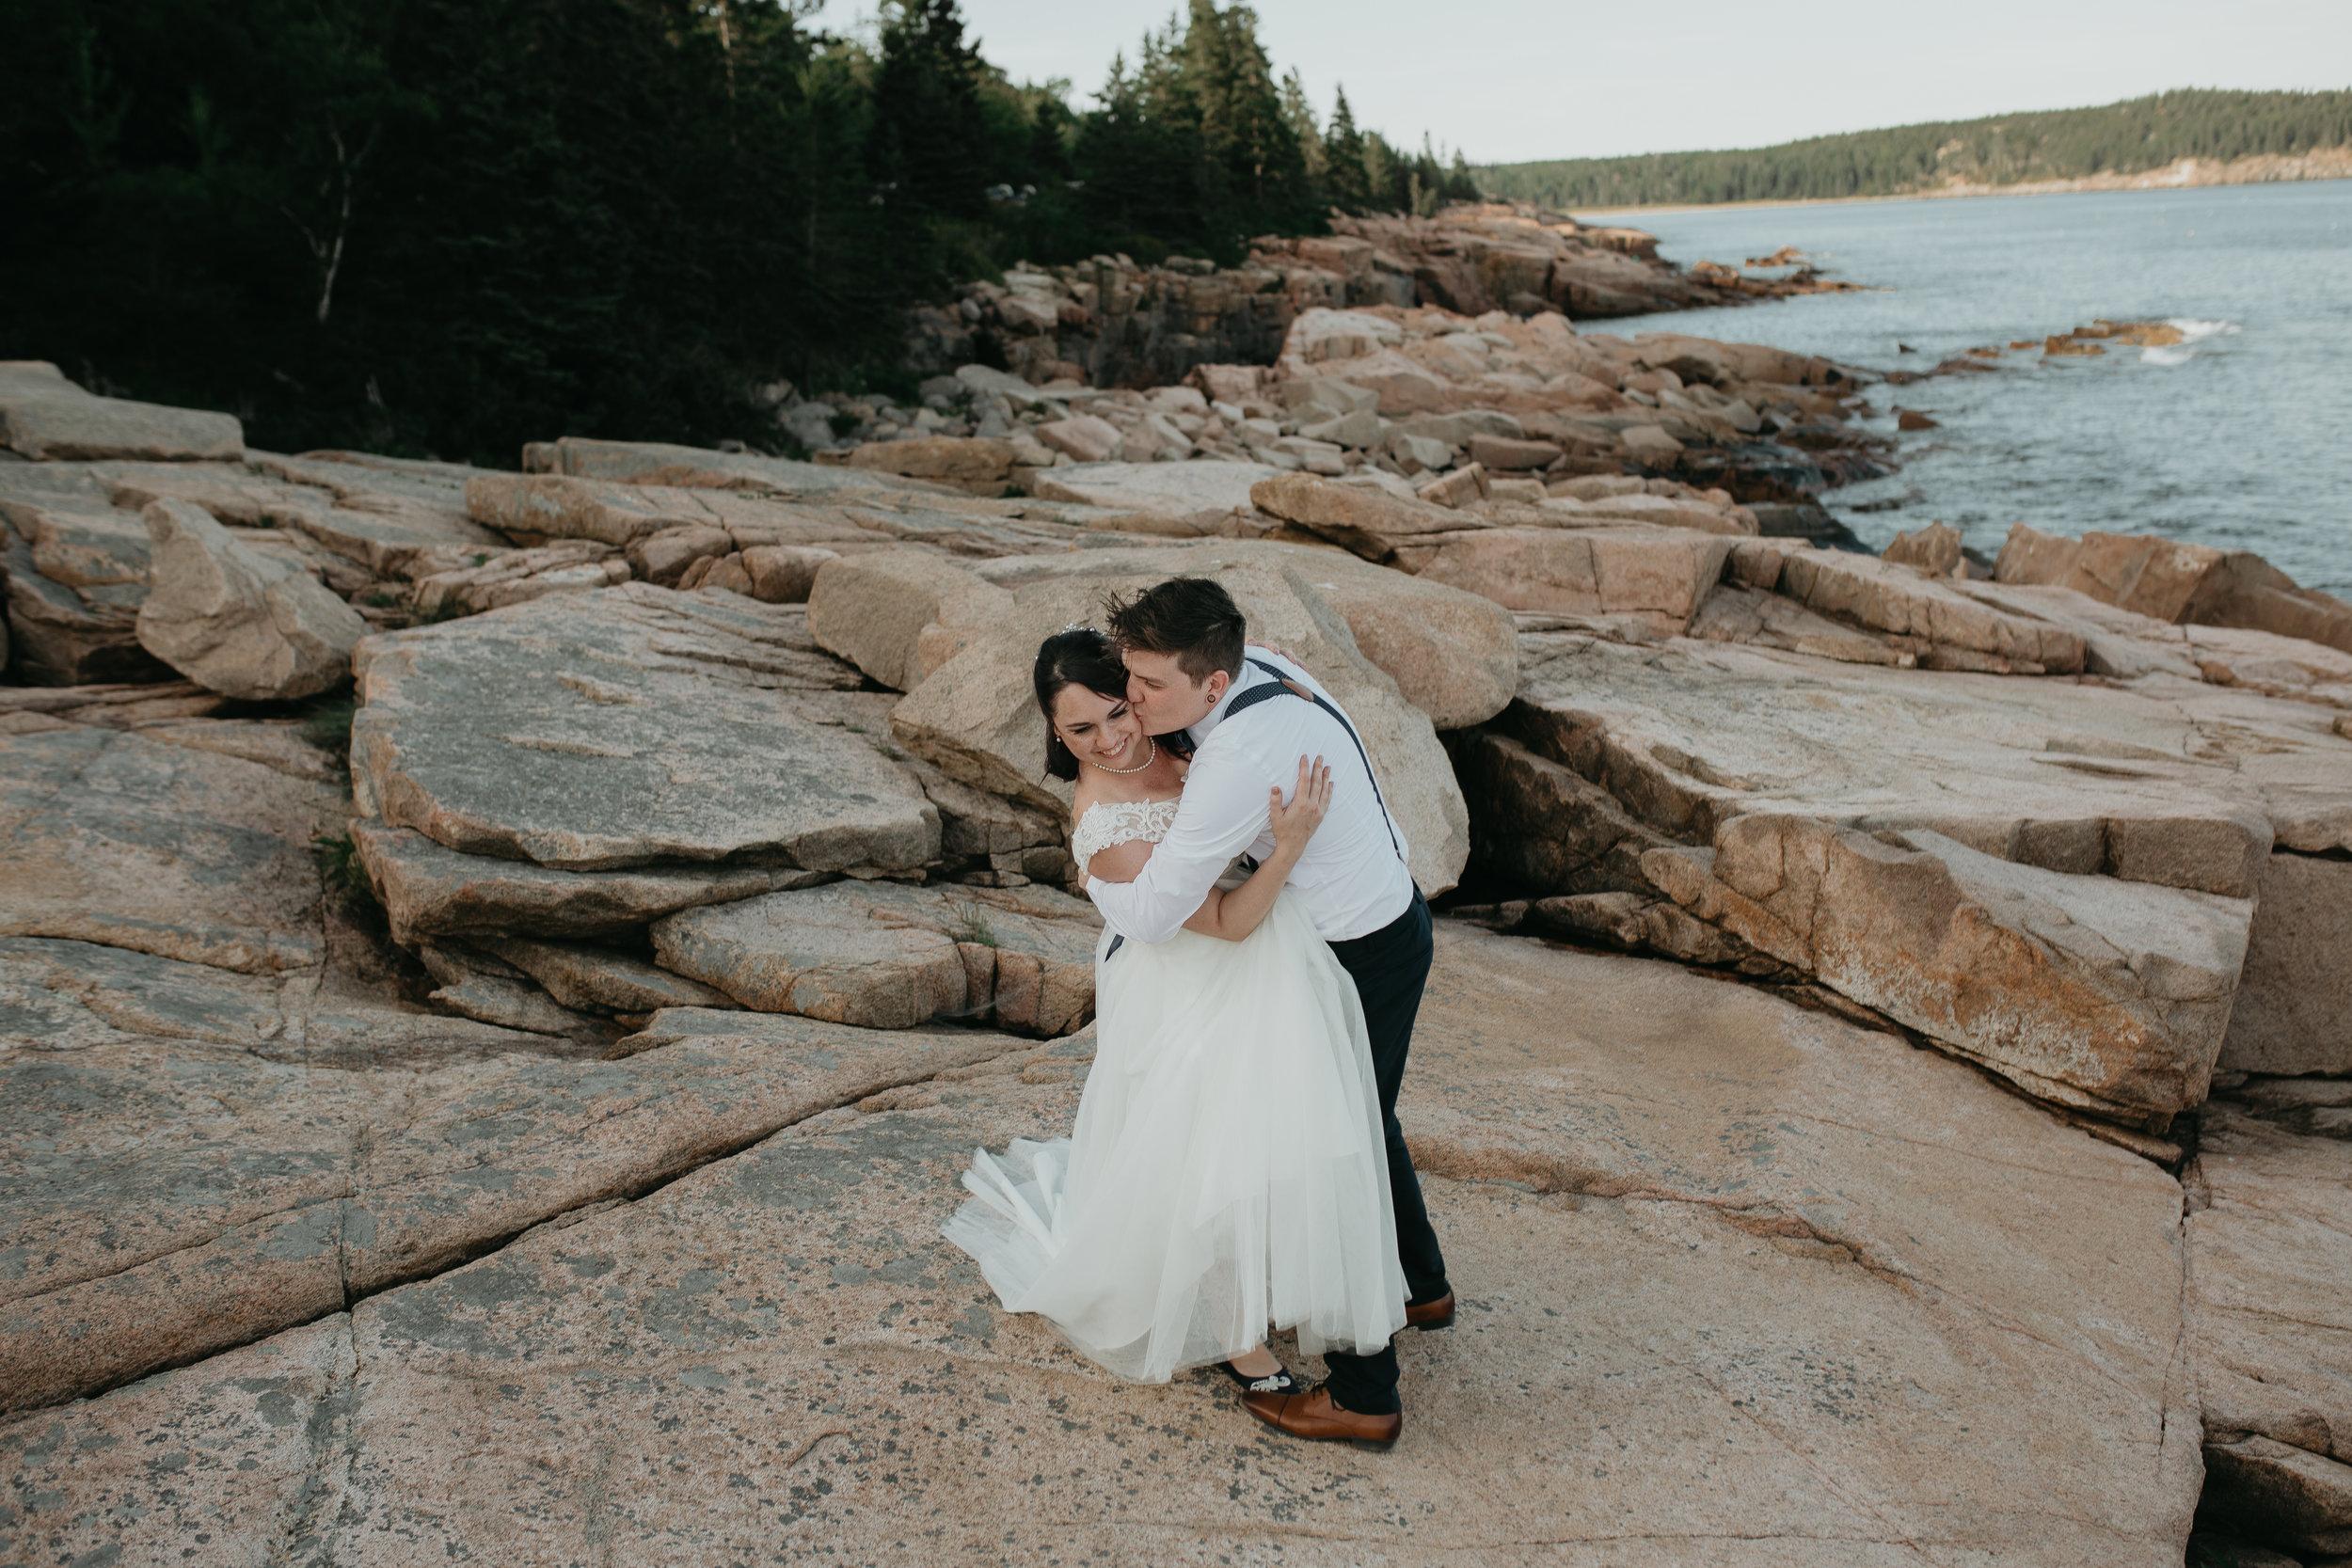 nicole-daacke-photography-Elopement-rocky-shoreline-coast-Acadia-National-Park-elopement-photographer-inspiration-maine-elopement-otter-cliffs-schoonic-head-point-47.jpg